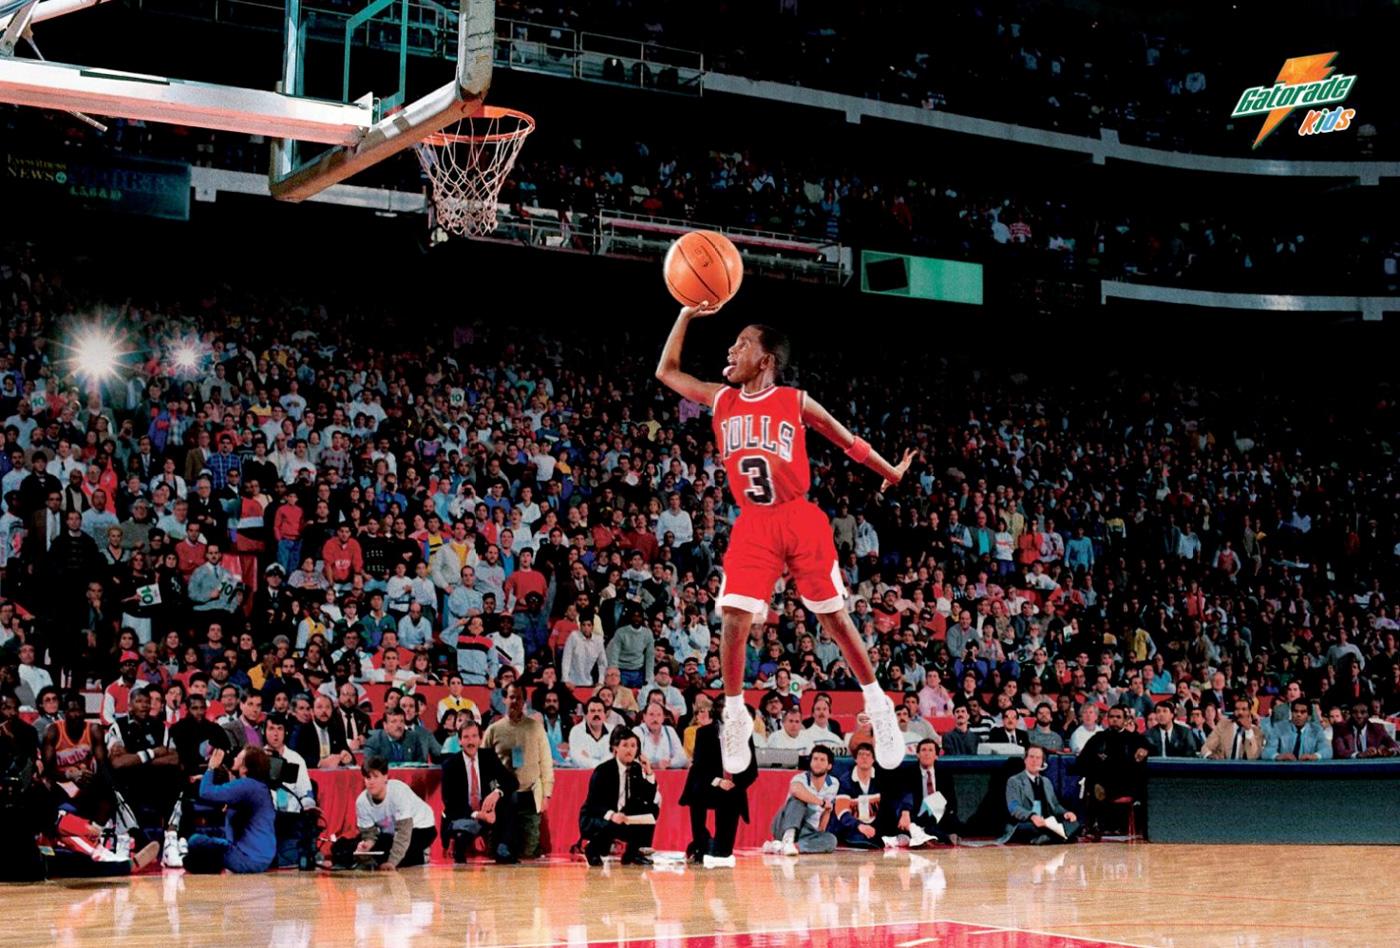 Gatorade Basketball Michael Jordan Dunk Hd 954652 Hd